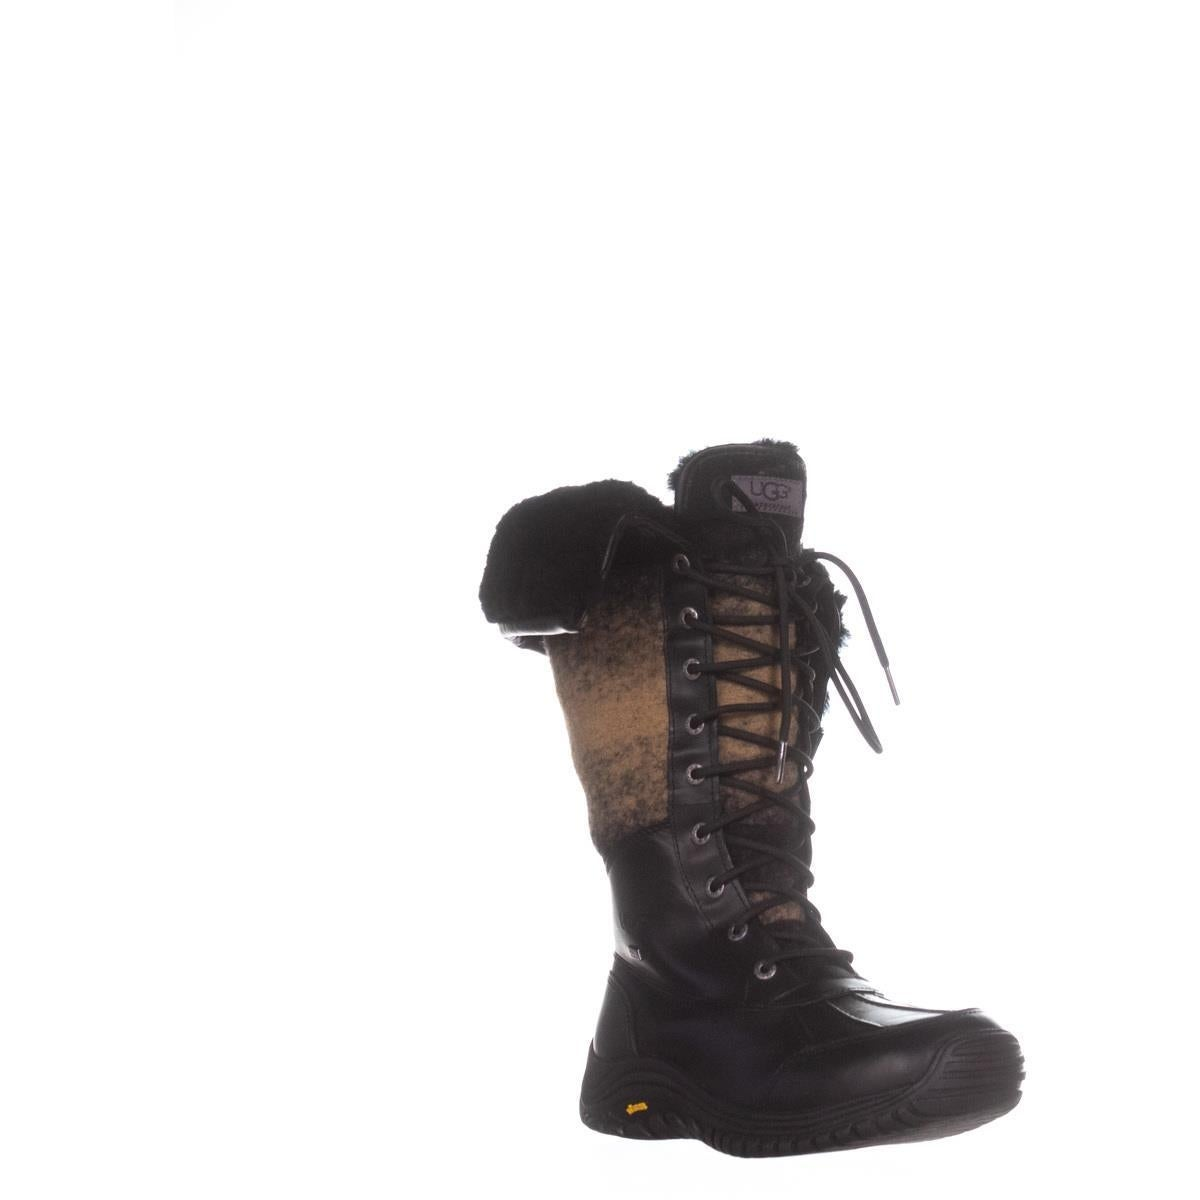 22805eeaf76 UGG Adirondack Weatherproof Boots, Black